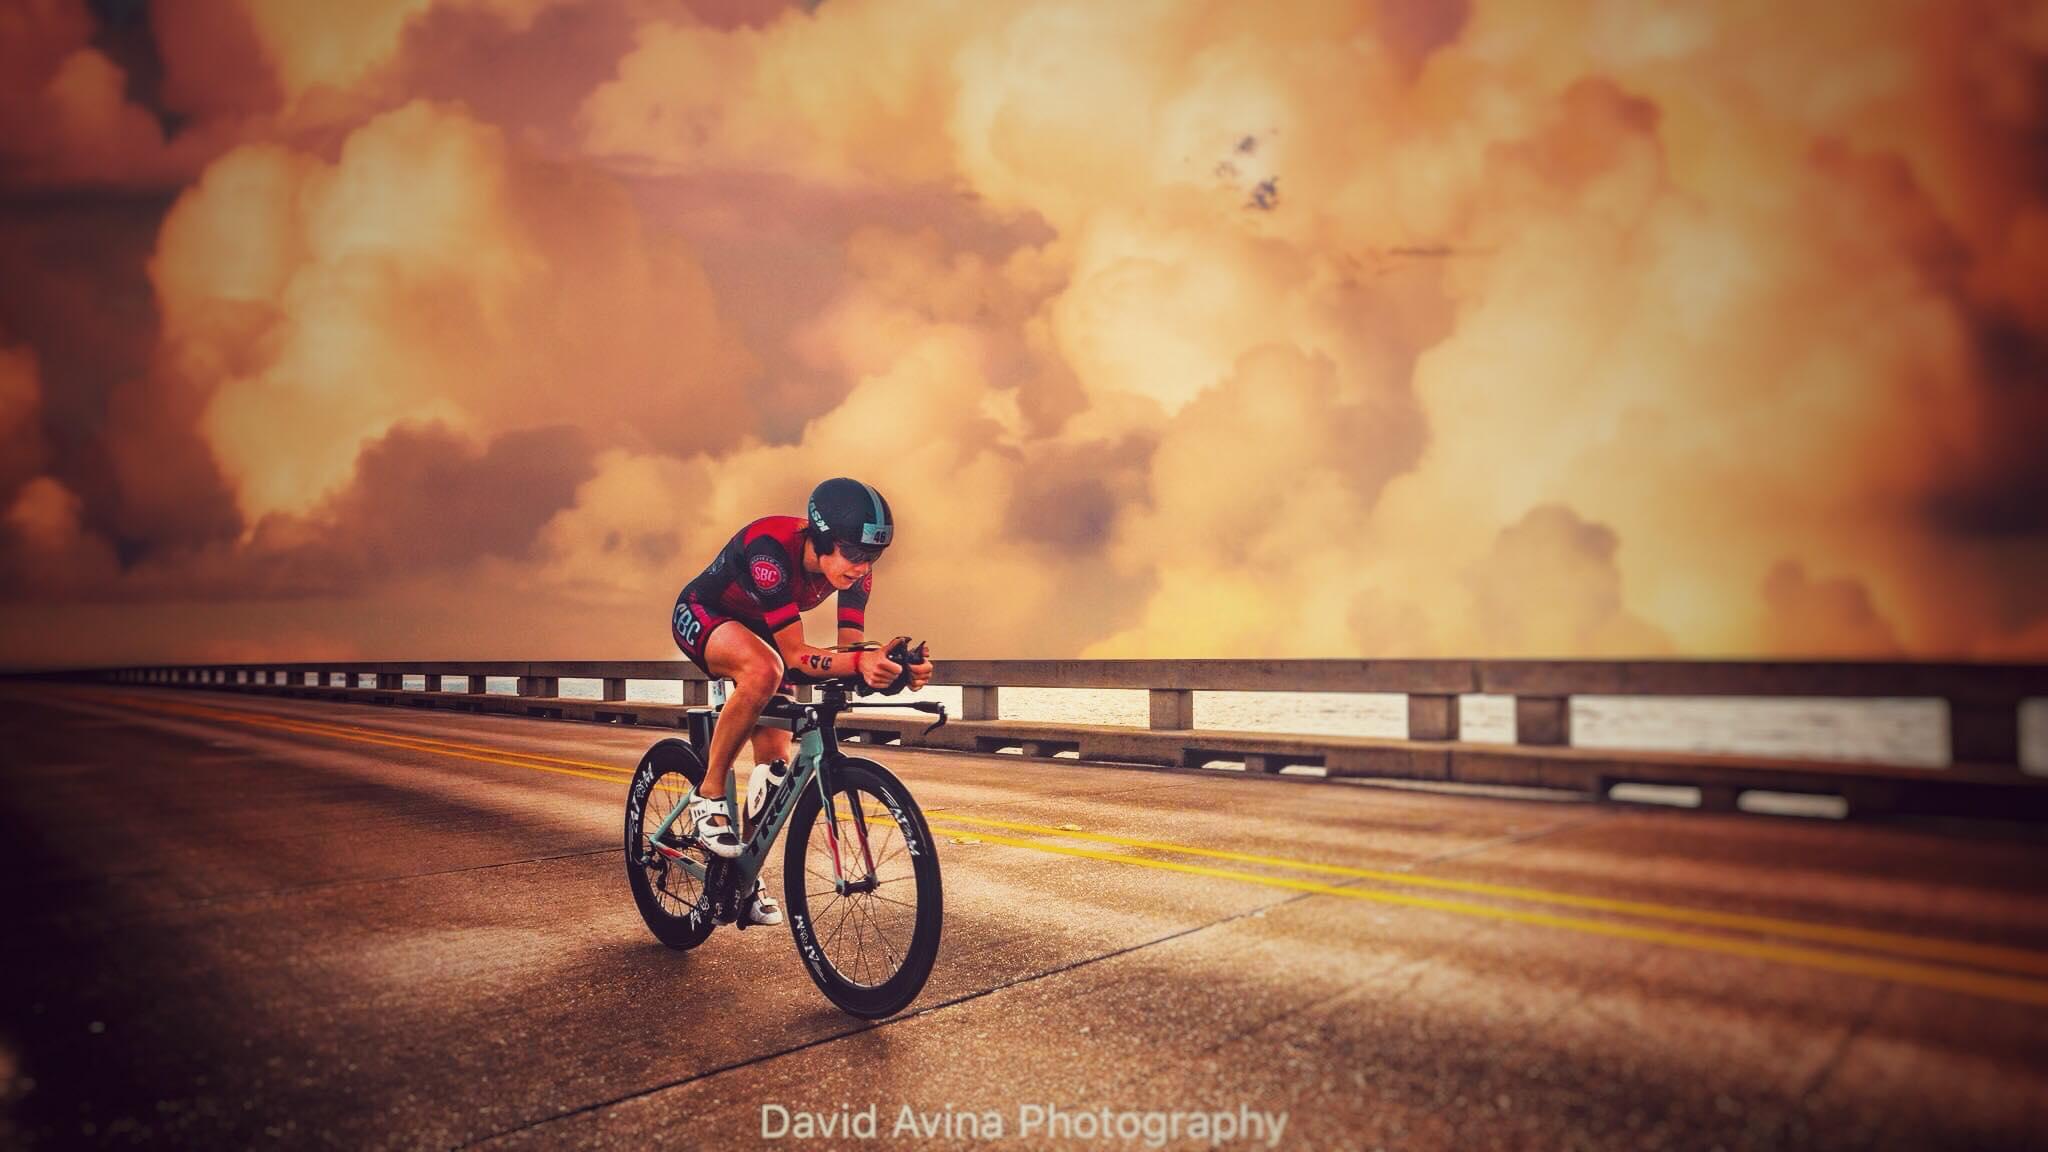 Coach_Terry_Wilson_Pursuit_of_The_Perfect_Race_IRONMAN_70.3_Texas_Danielle_Dingman_Bike.jpg